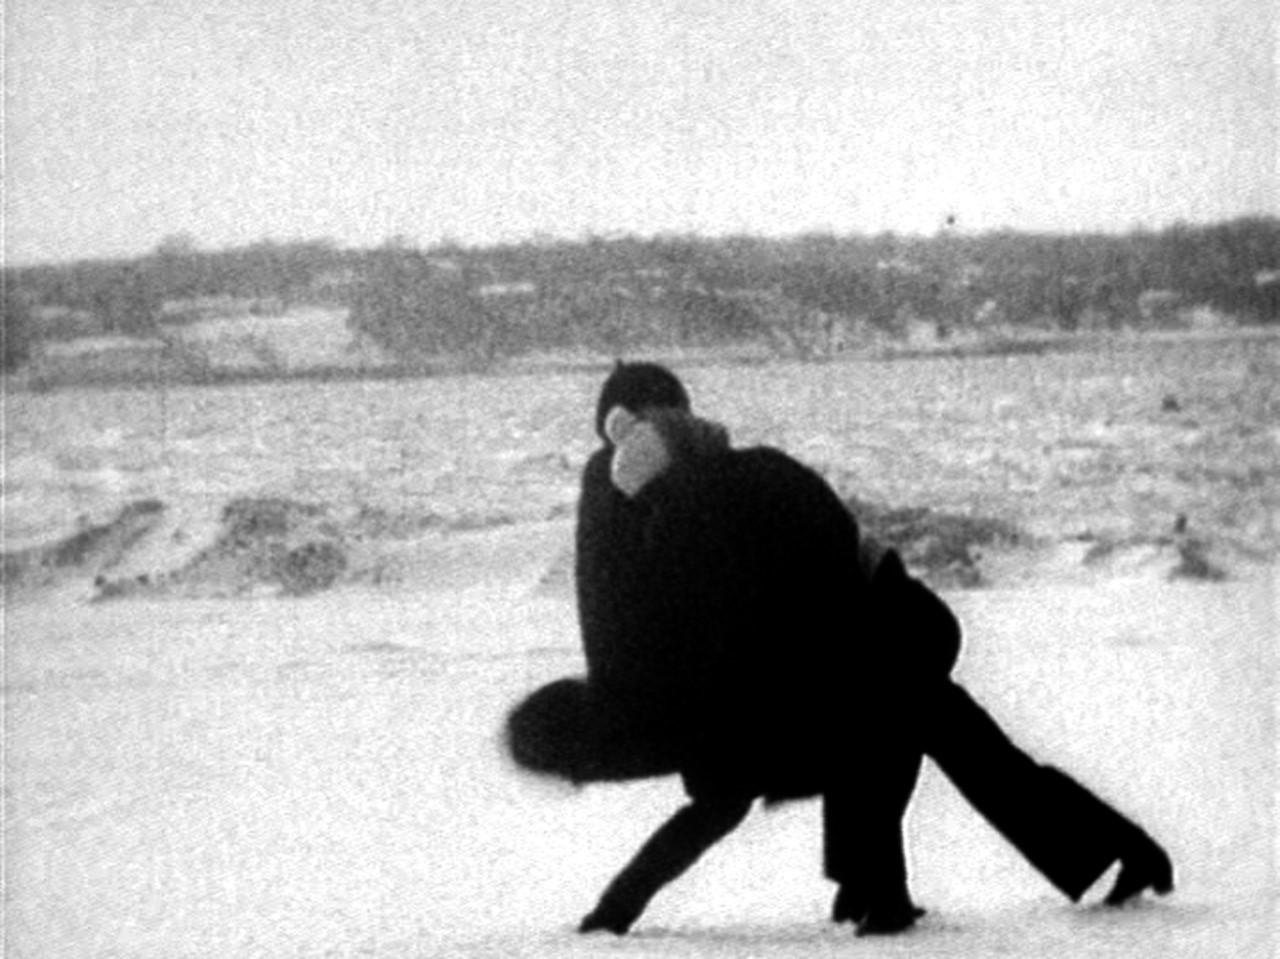 Joan Jonas, Wind, 1968  Courtesy Electronic Arts Intermix (EAI), New York